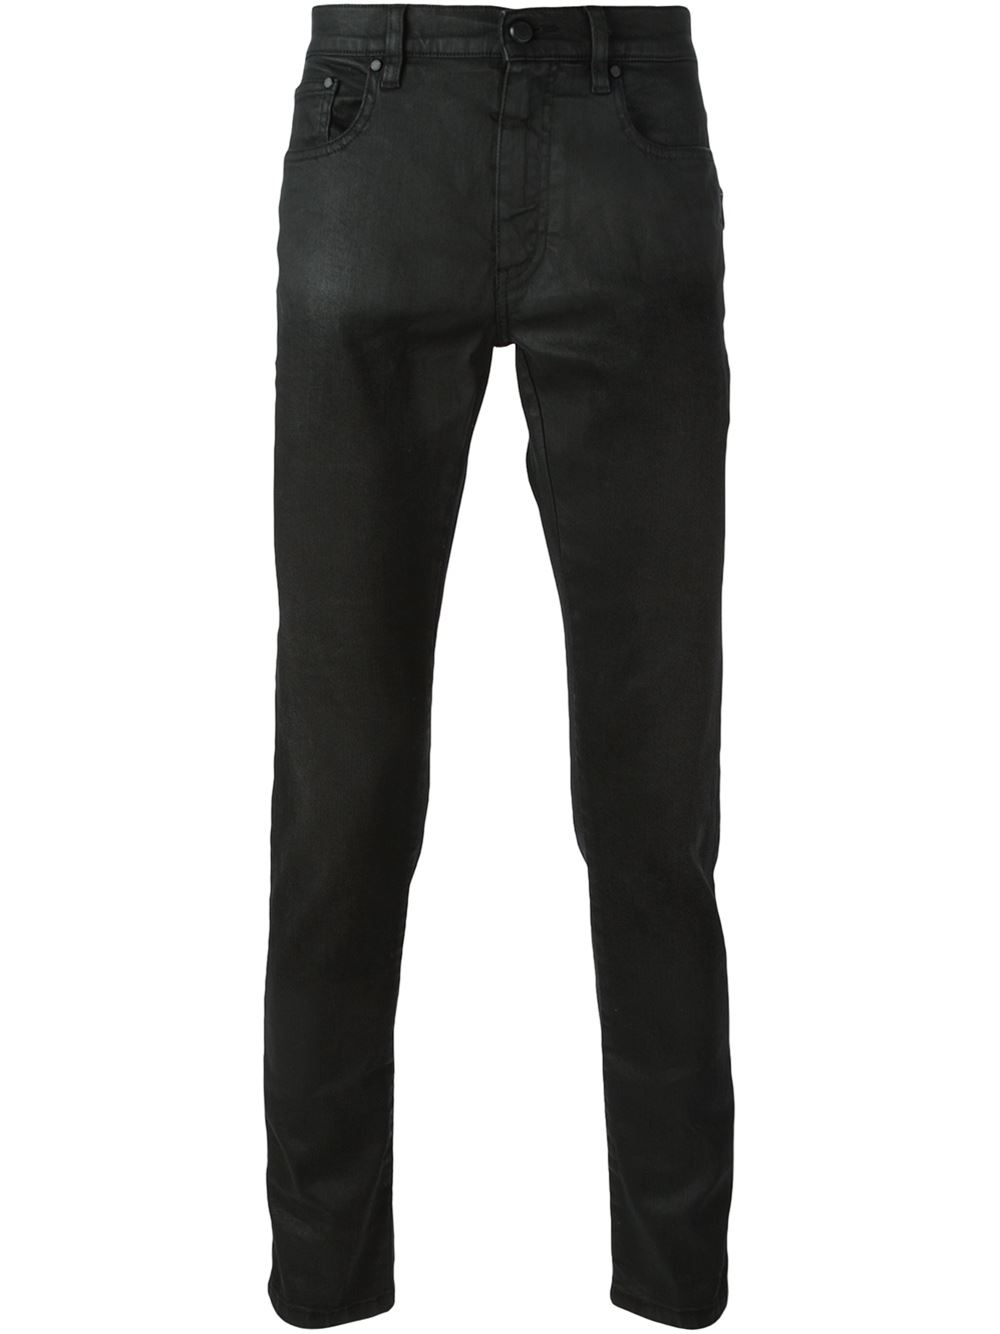 Plus Size WAX Black Jean Jacket $ Quick view - Plus Size WAX Distressed Denim Shorts. Plus Size WAX Distressed Denim Shorts $$ Quick view - Plus Size WAX Colored Skinny Jeans. Plus Size WAX Colored Skinny Jeans $ Quick view - Plus Size WAX 3 Button Distressed Jeans. Plus Size WAX 3 Button Distressed Jeans $$